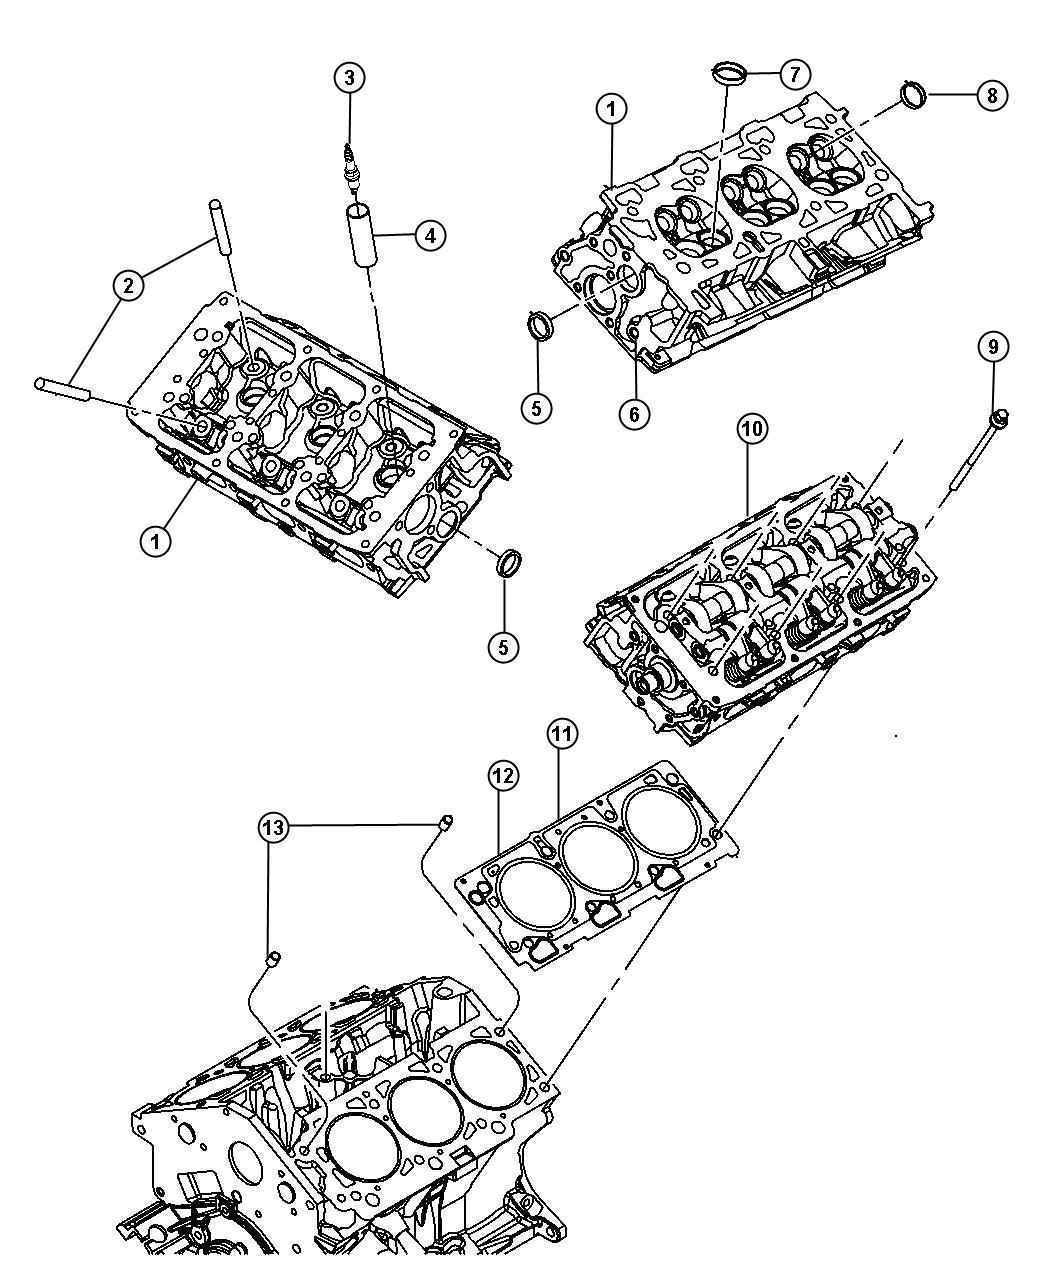 tags: #chrysler 440 engine specifications#dodge 383 engine specs#chrysler 2  4 engine horsepower#chrysler pentastar engine head problem#chrysler b